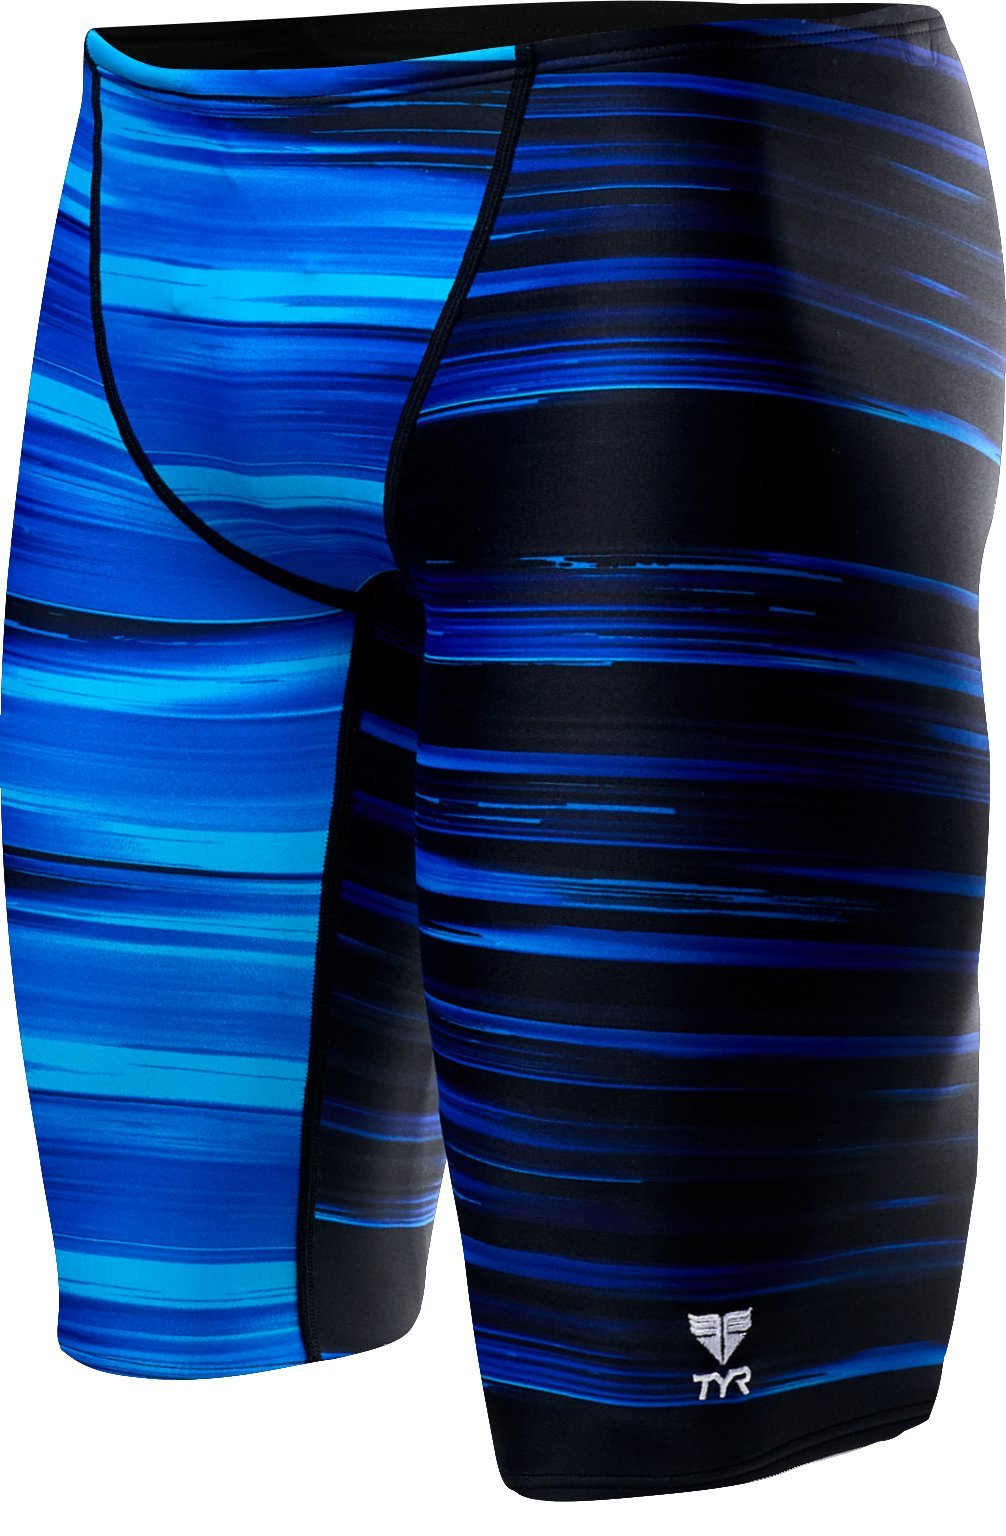 0aaa97a6e9e TYR Men's Lm Jammer Swimsuit, Blue, 32